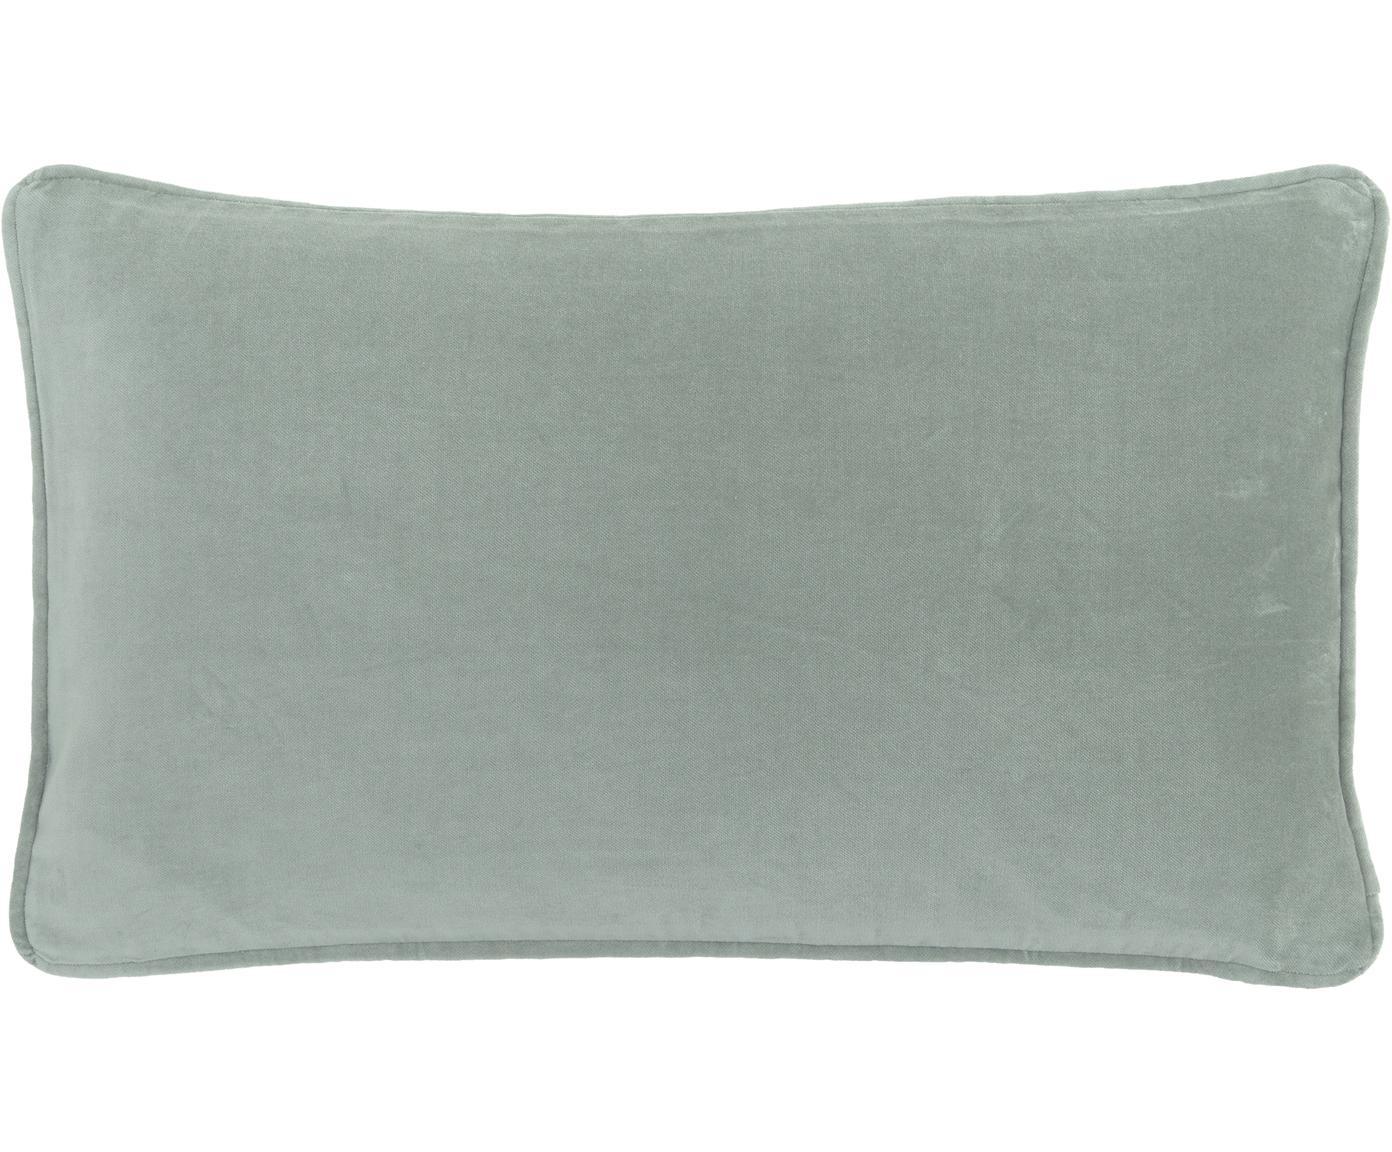 Federa arredo in velluto in verde salvia Dana, Velluto di cotone, Verde salvia, Larg. 30 x Lung. 50 cm